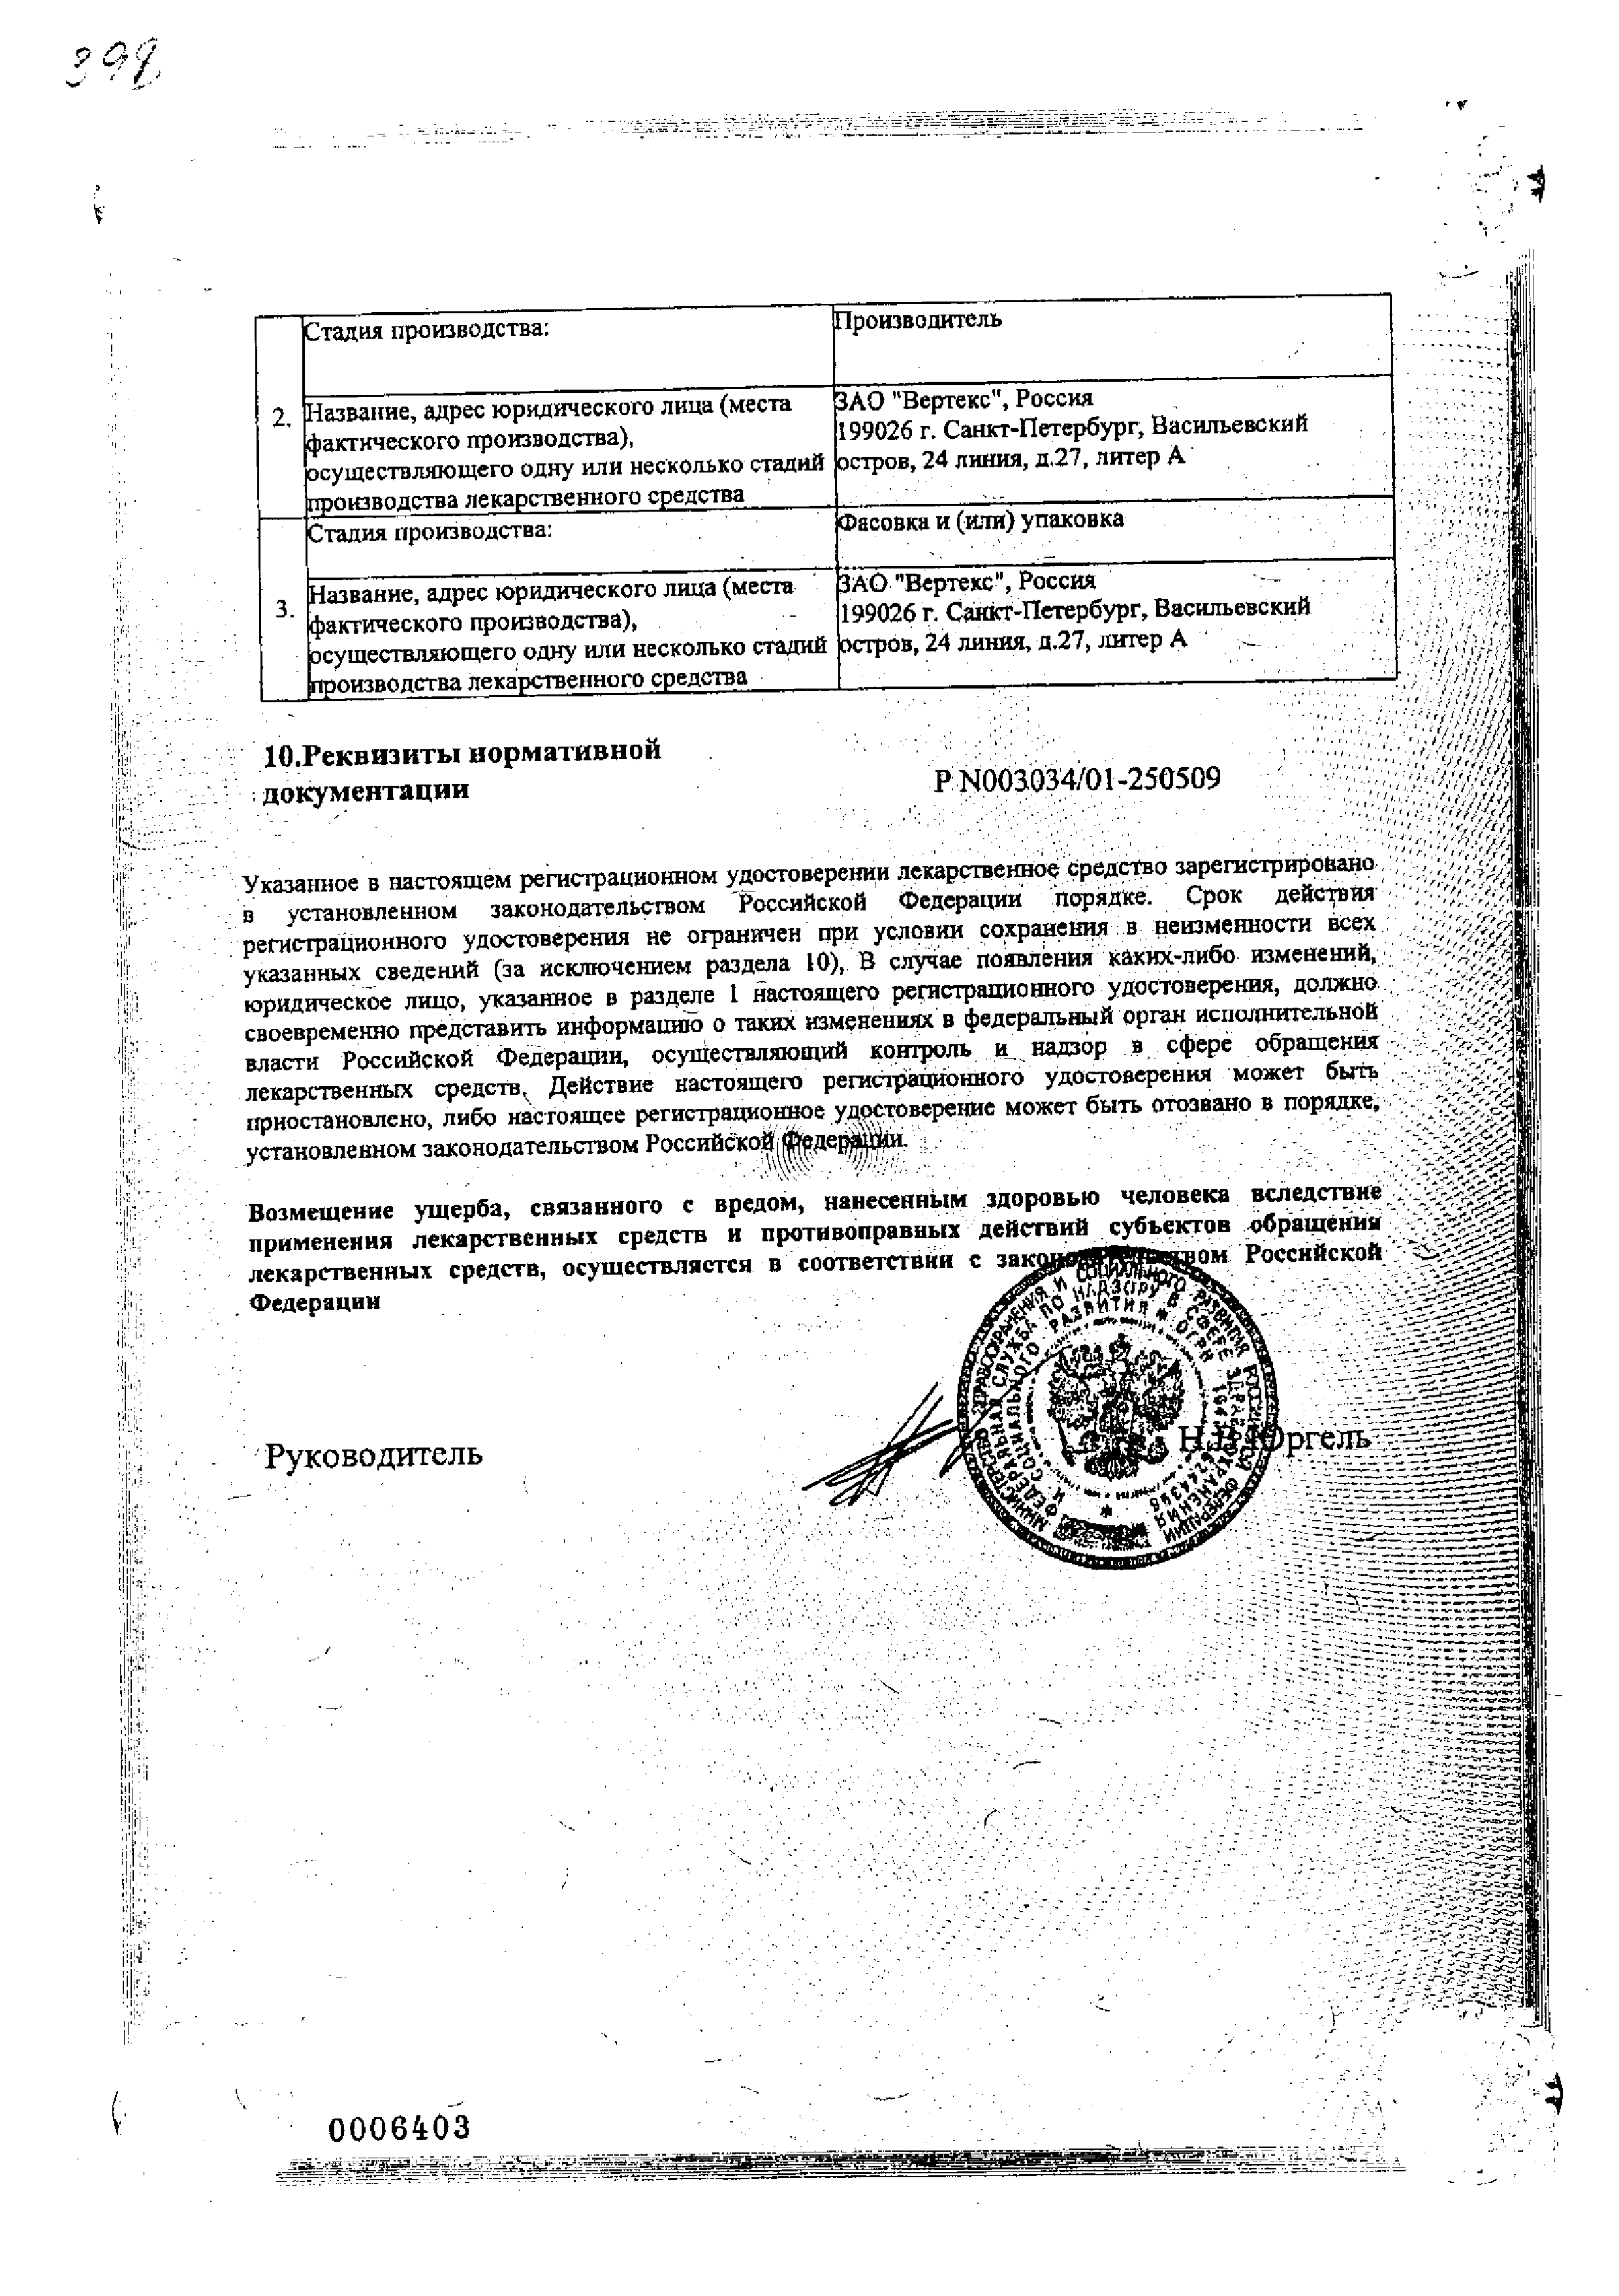 Итразол сертификат